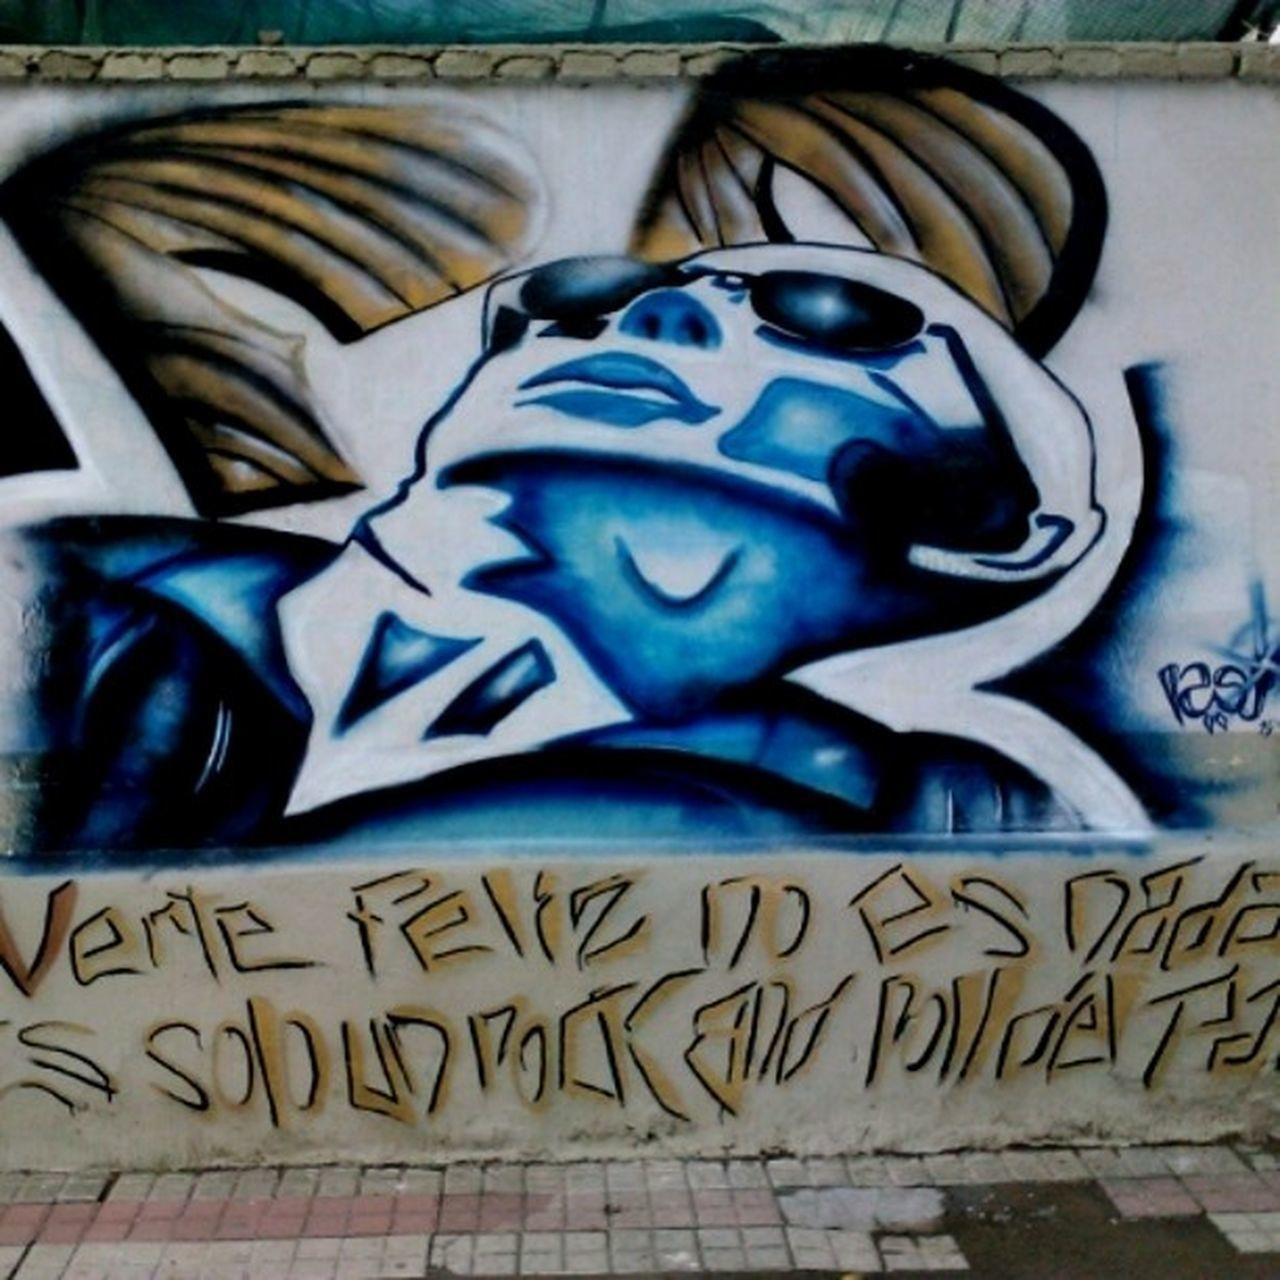 IndioSolari Redondos Graffiti Mural Patricio Rey